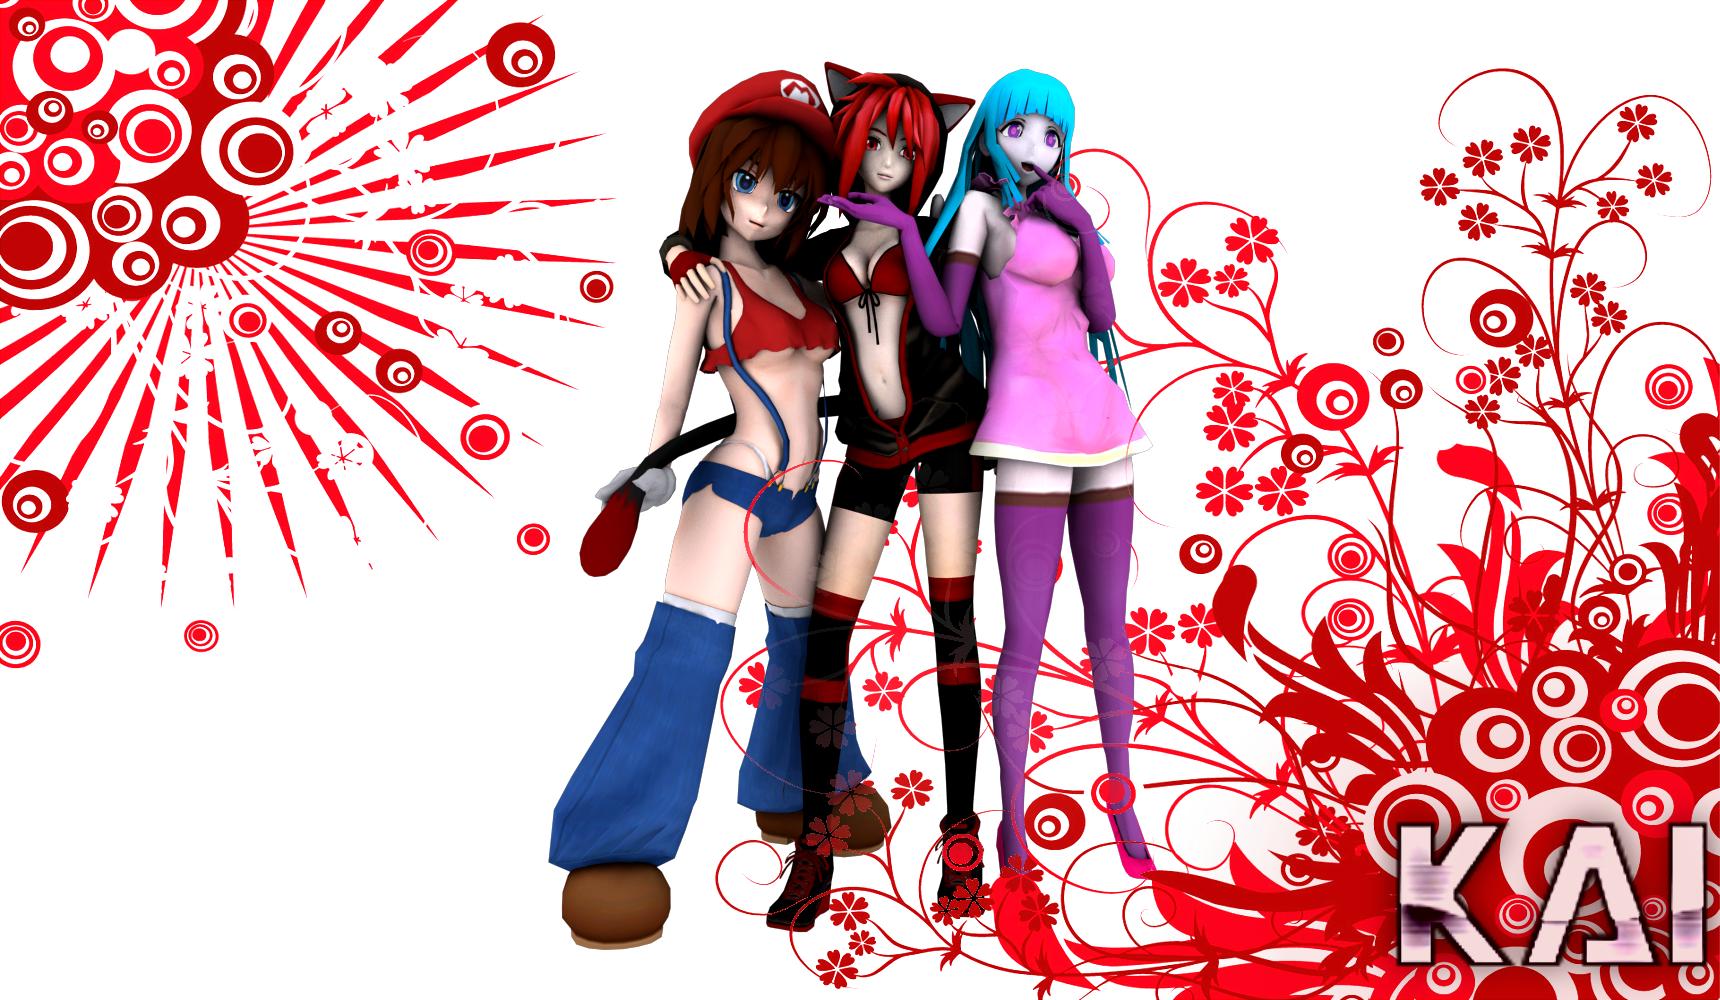 Mary, Ryusei and Meme